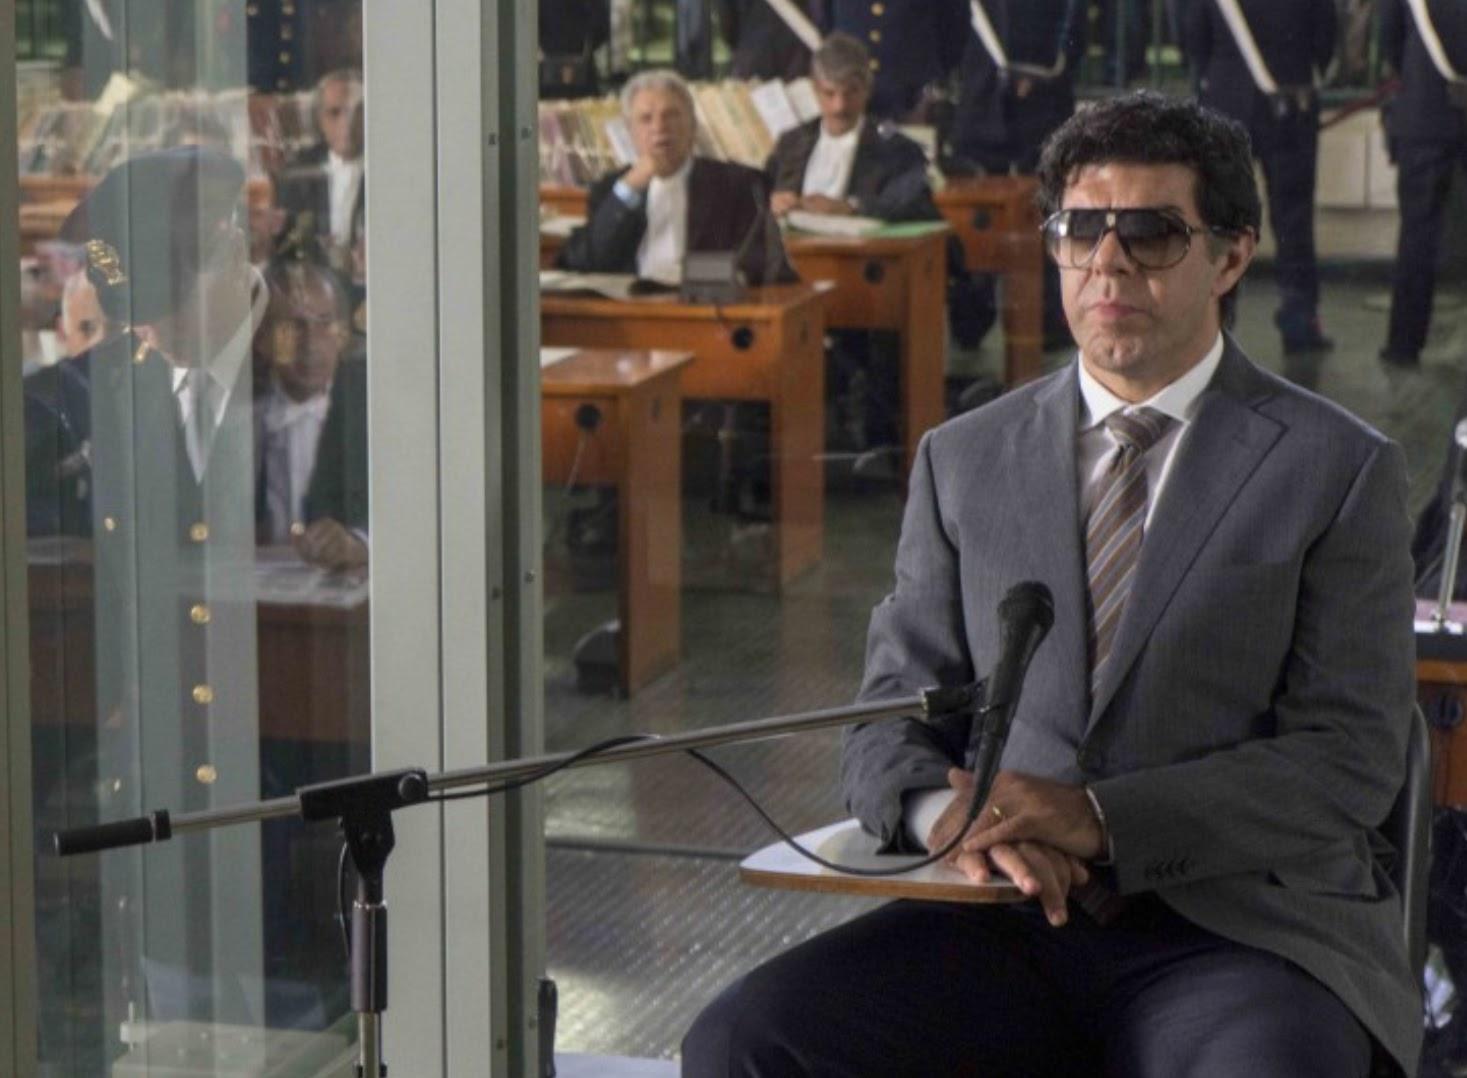 Buscetta's story is told in the Italian film Il Traditore (The Traitor) with Pierfrancesco Favino (above)